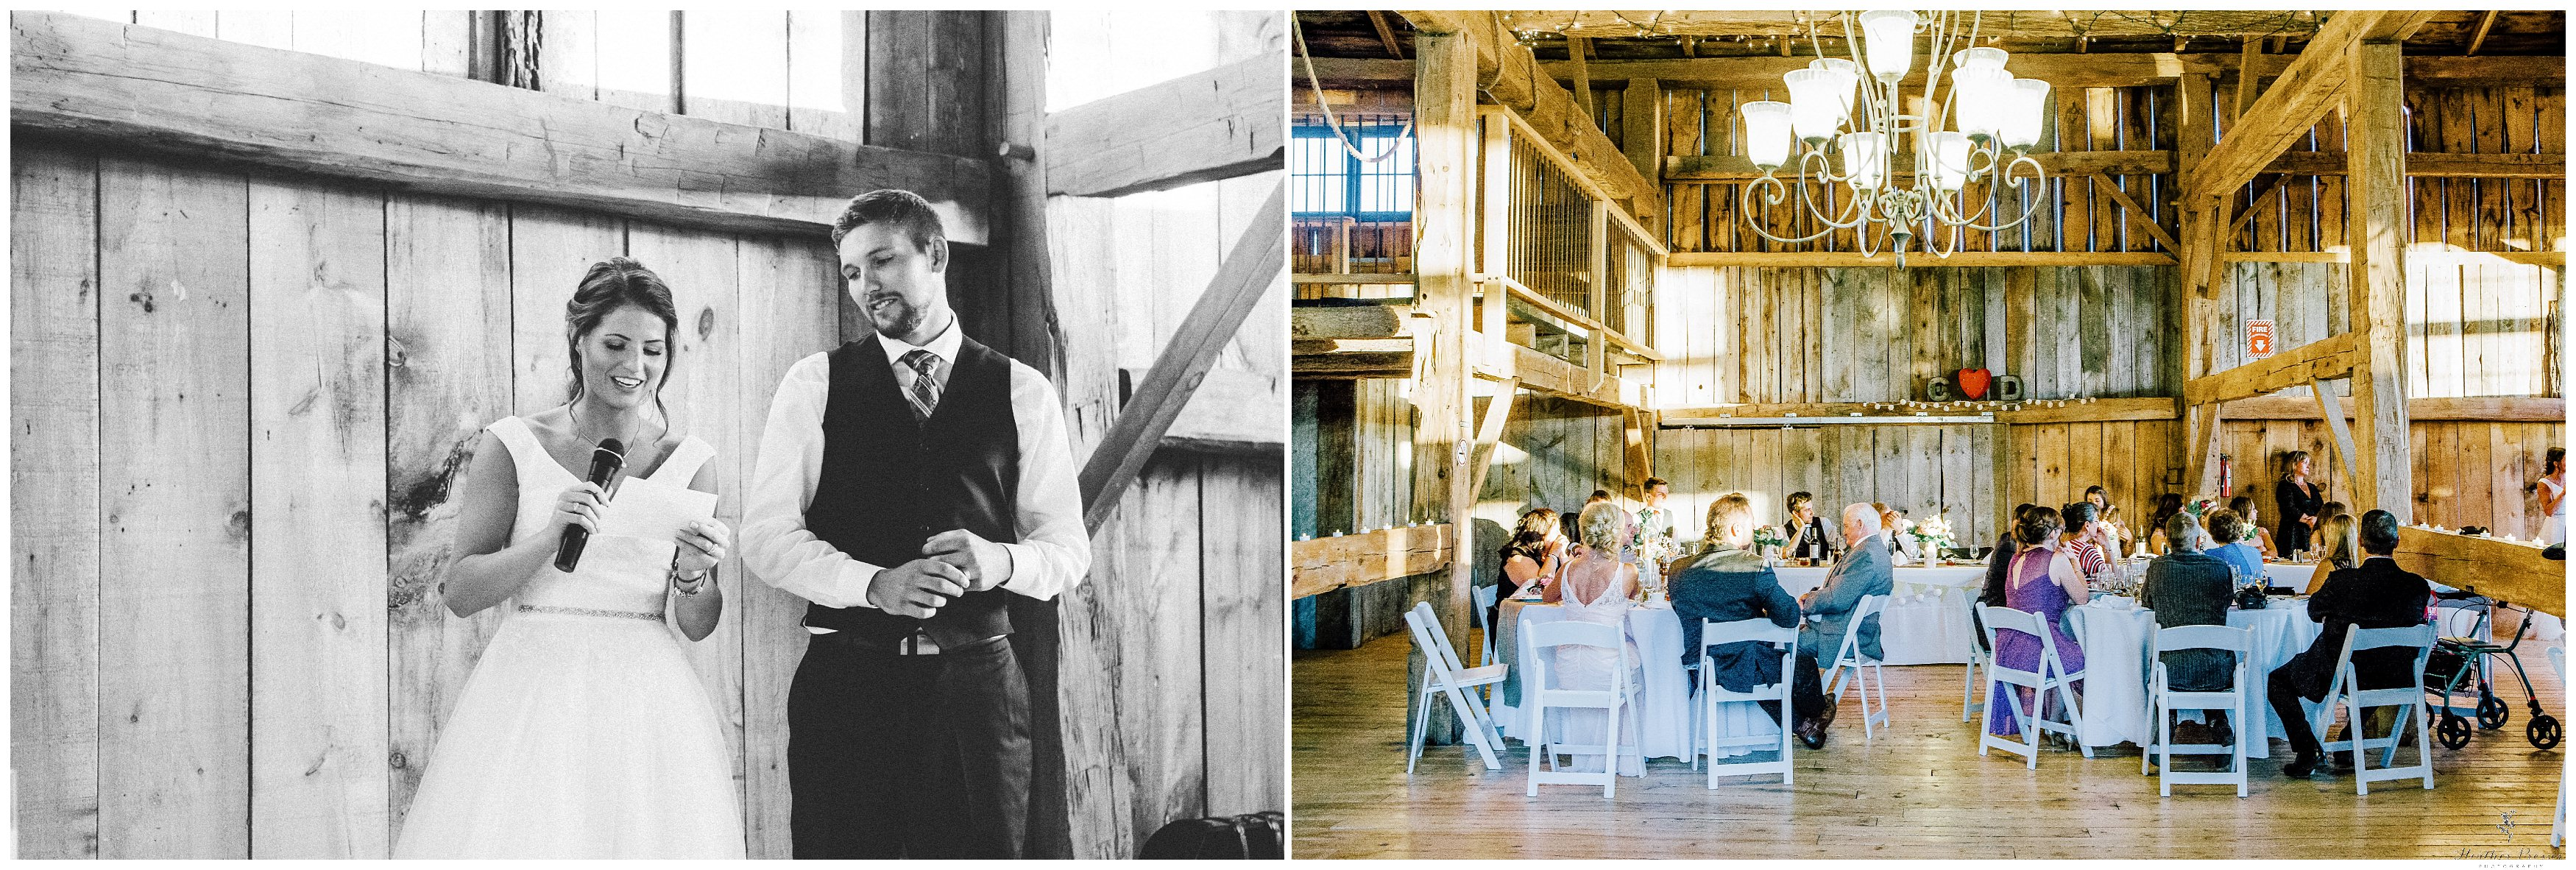 Ontario Barn Wedding_2257.jpg